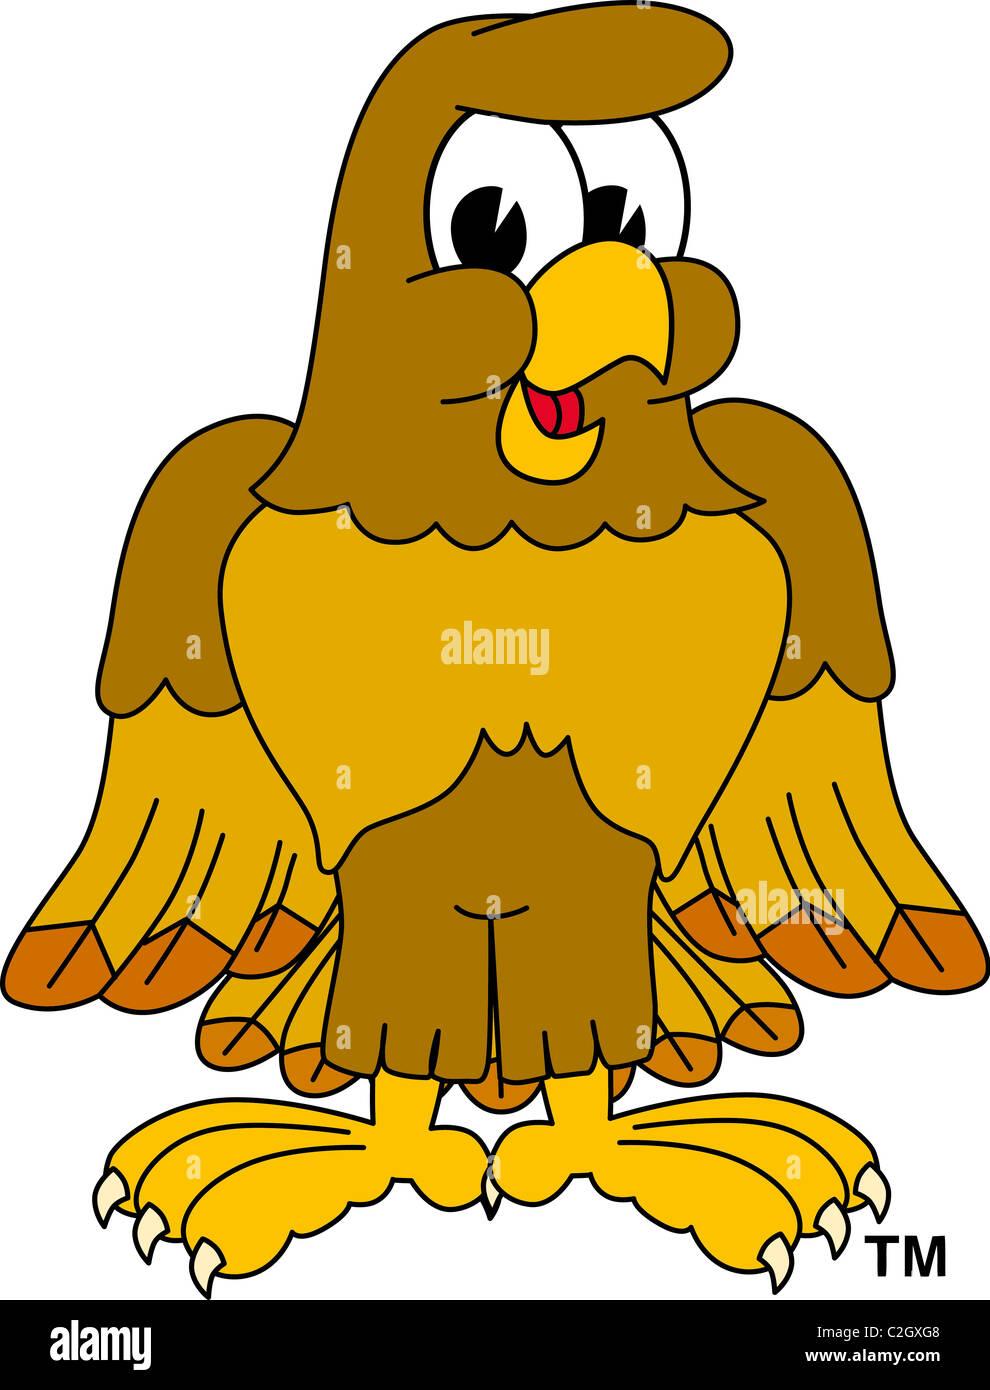 medium resolution of cartoon hawk eagle or falcon mascot clip art